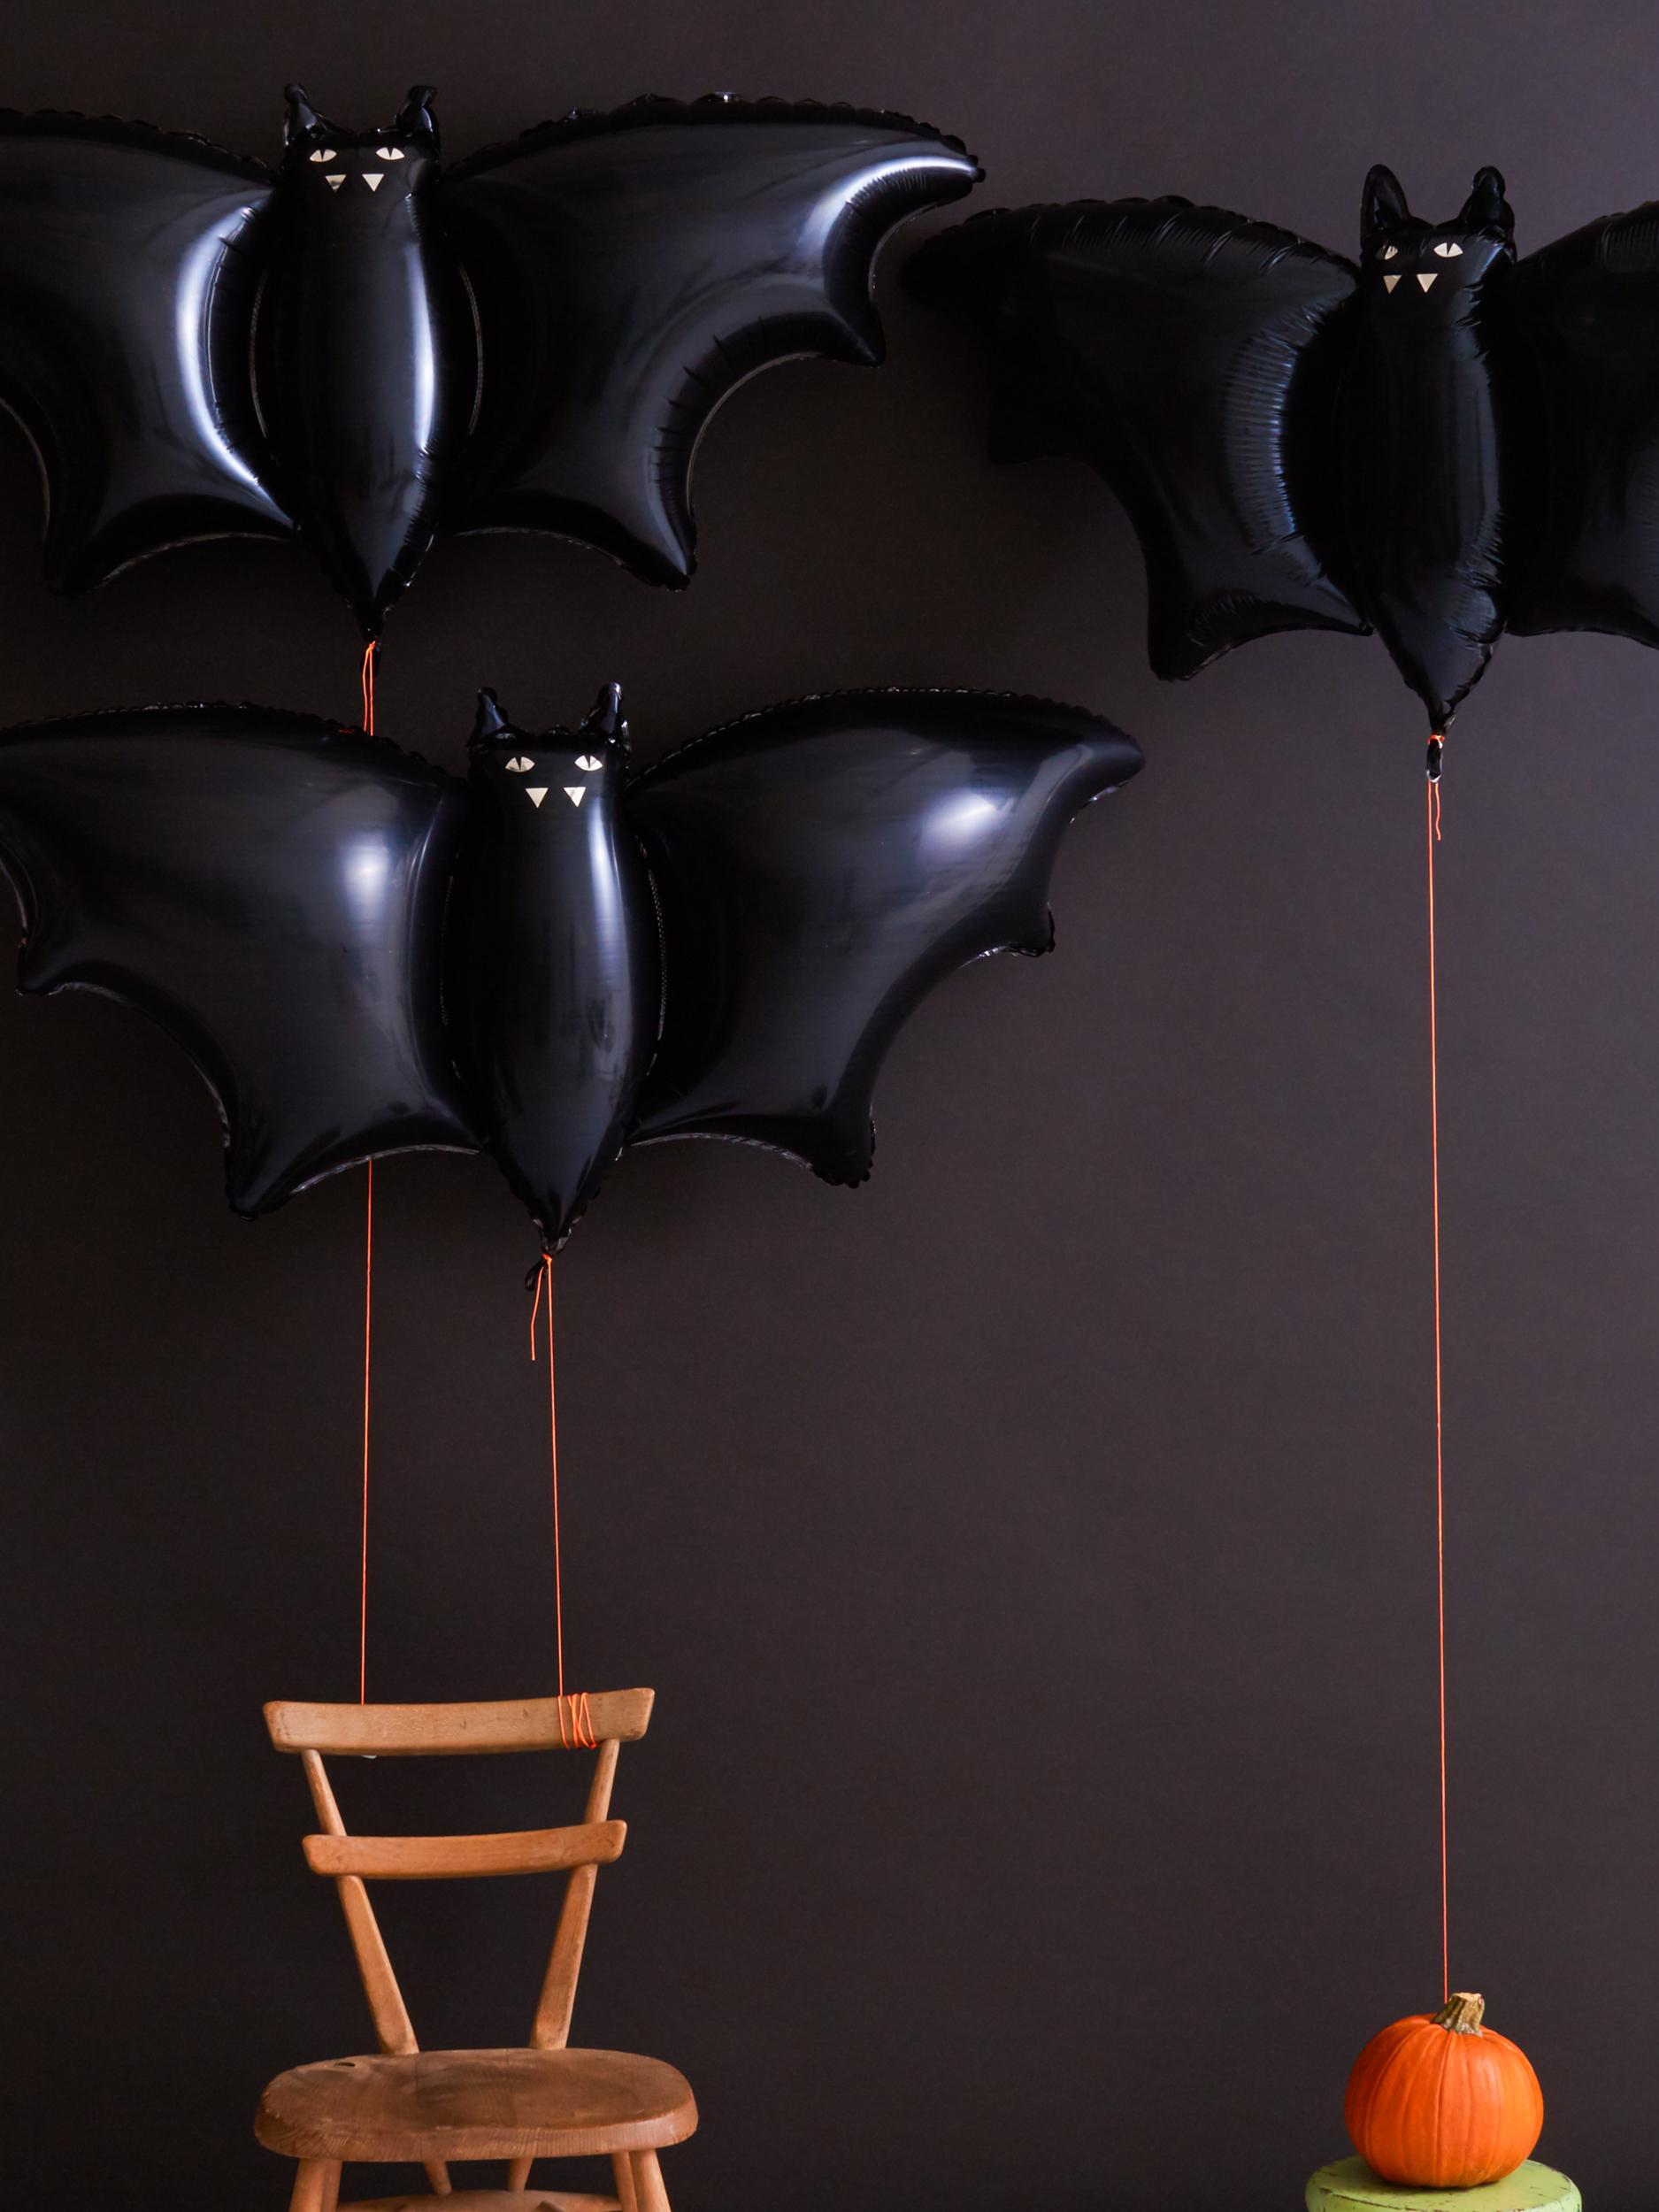 3 ballons mylar chauve-souris en aluminium